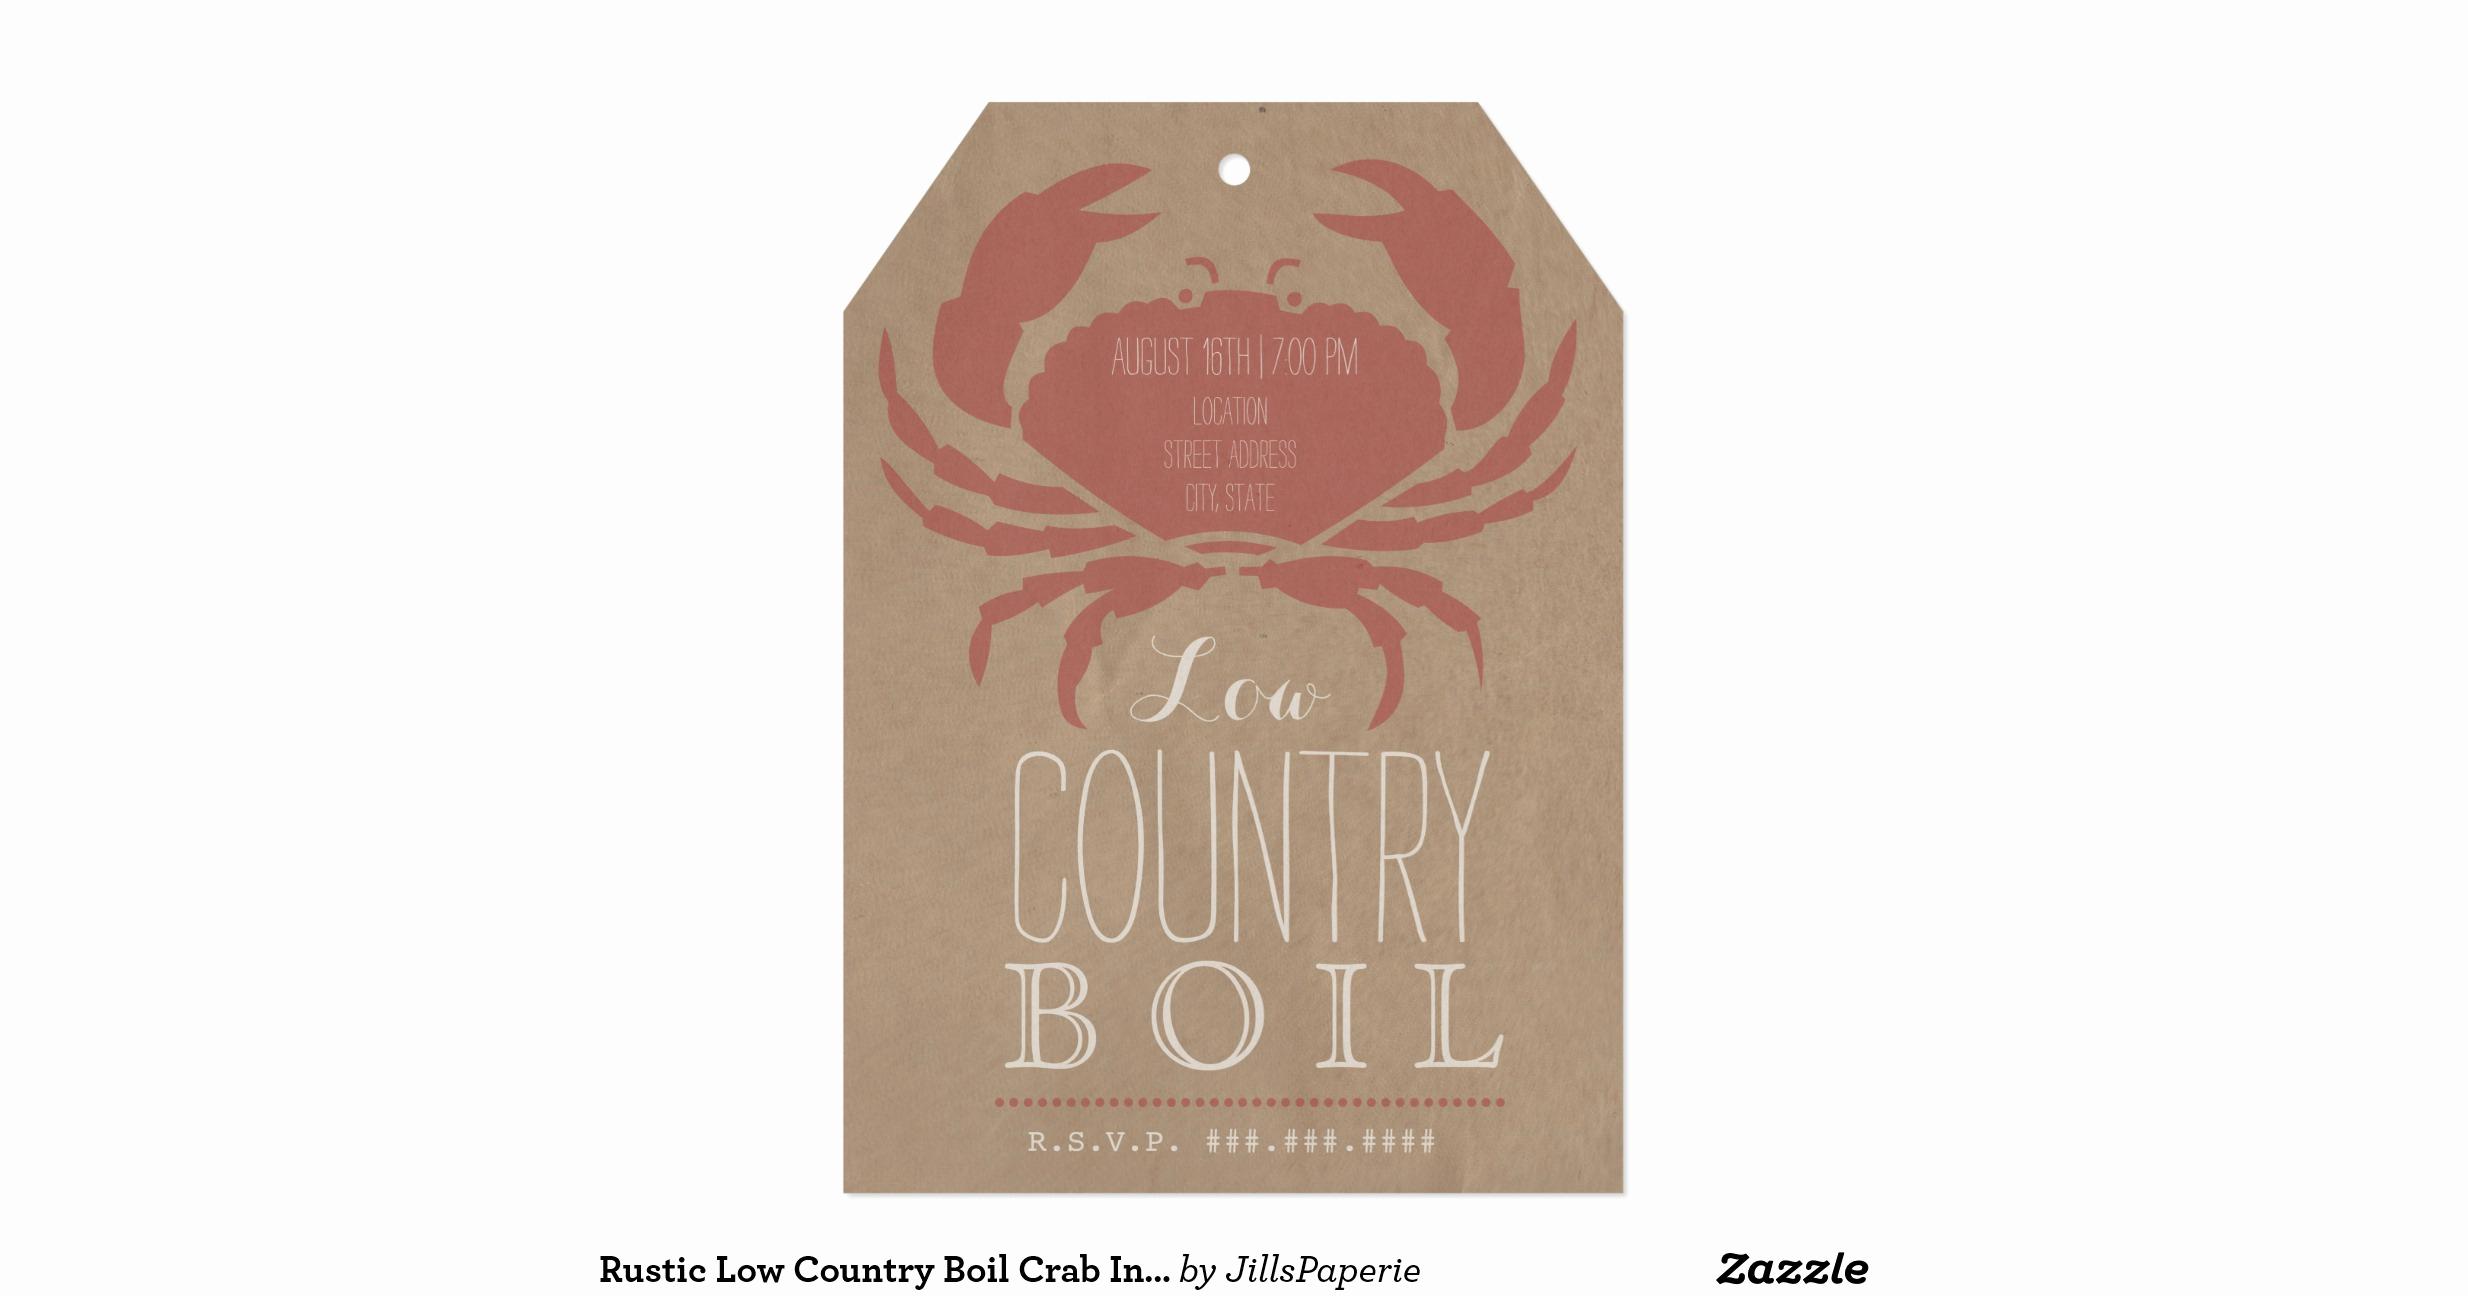 Low Country Boil Invitation Elegant Rustic Low Country Boil Crab Invitation